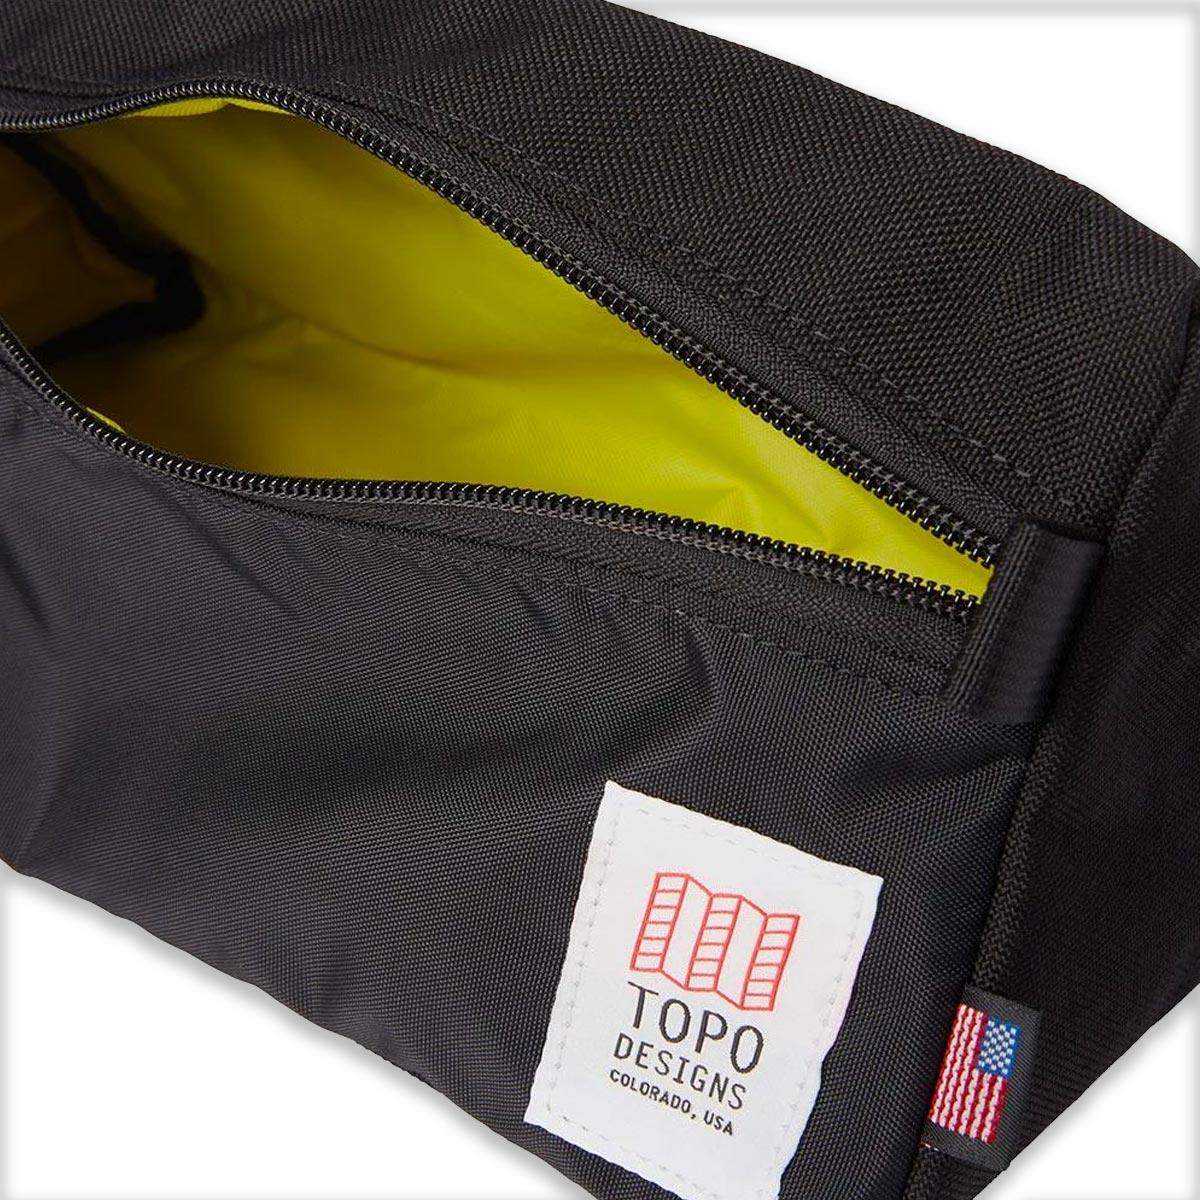 Topo Designs Dopp Kit Black, water-resistant, travel light, accessory bag